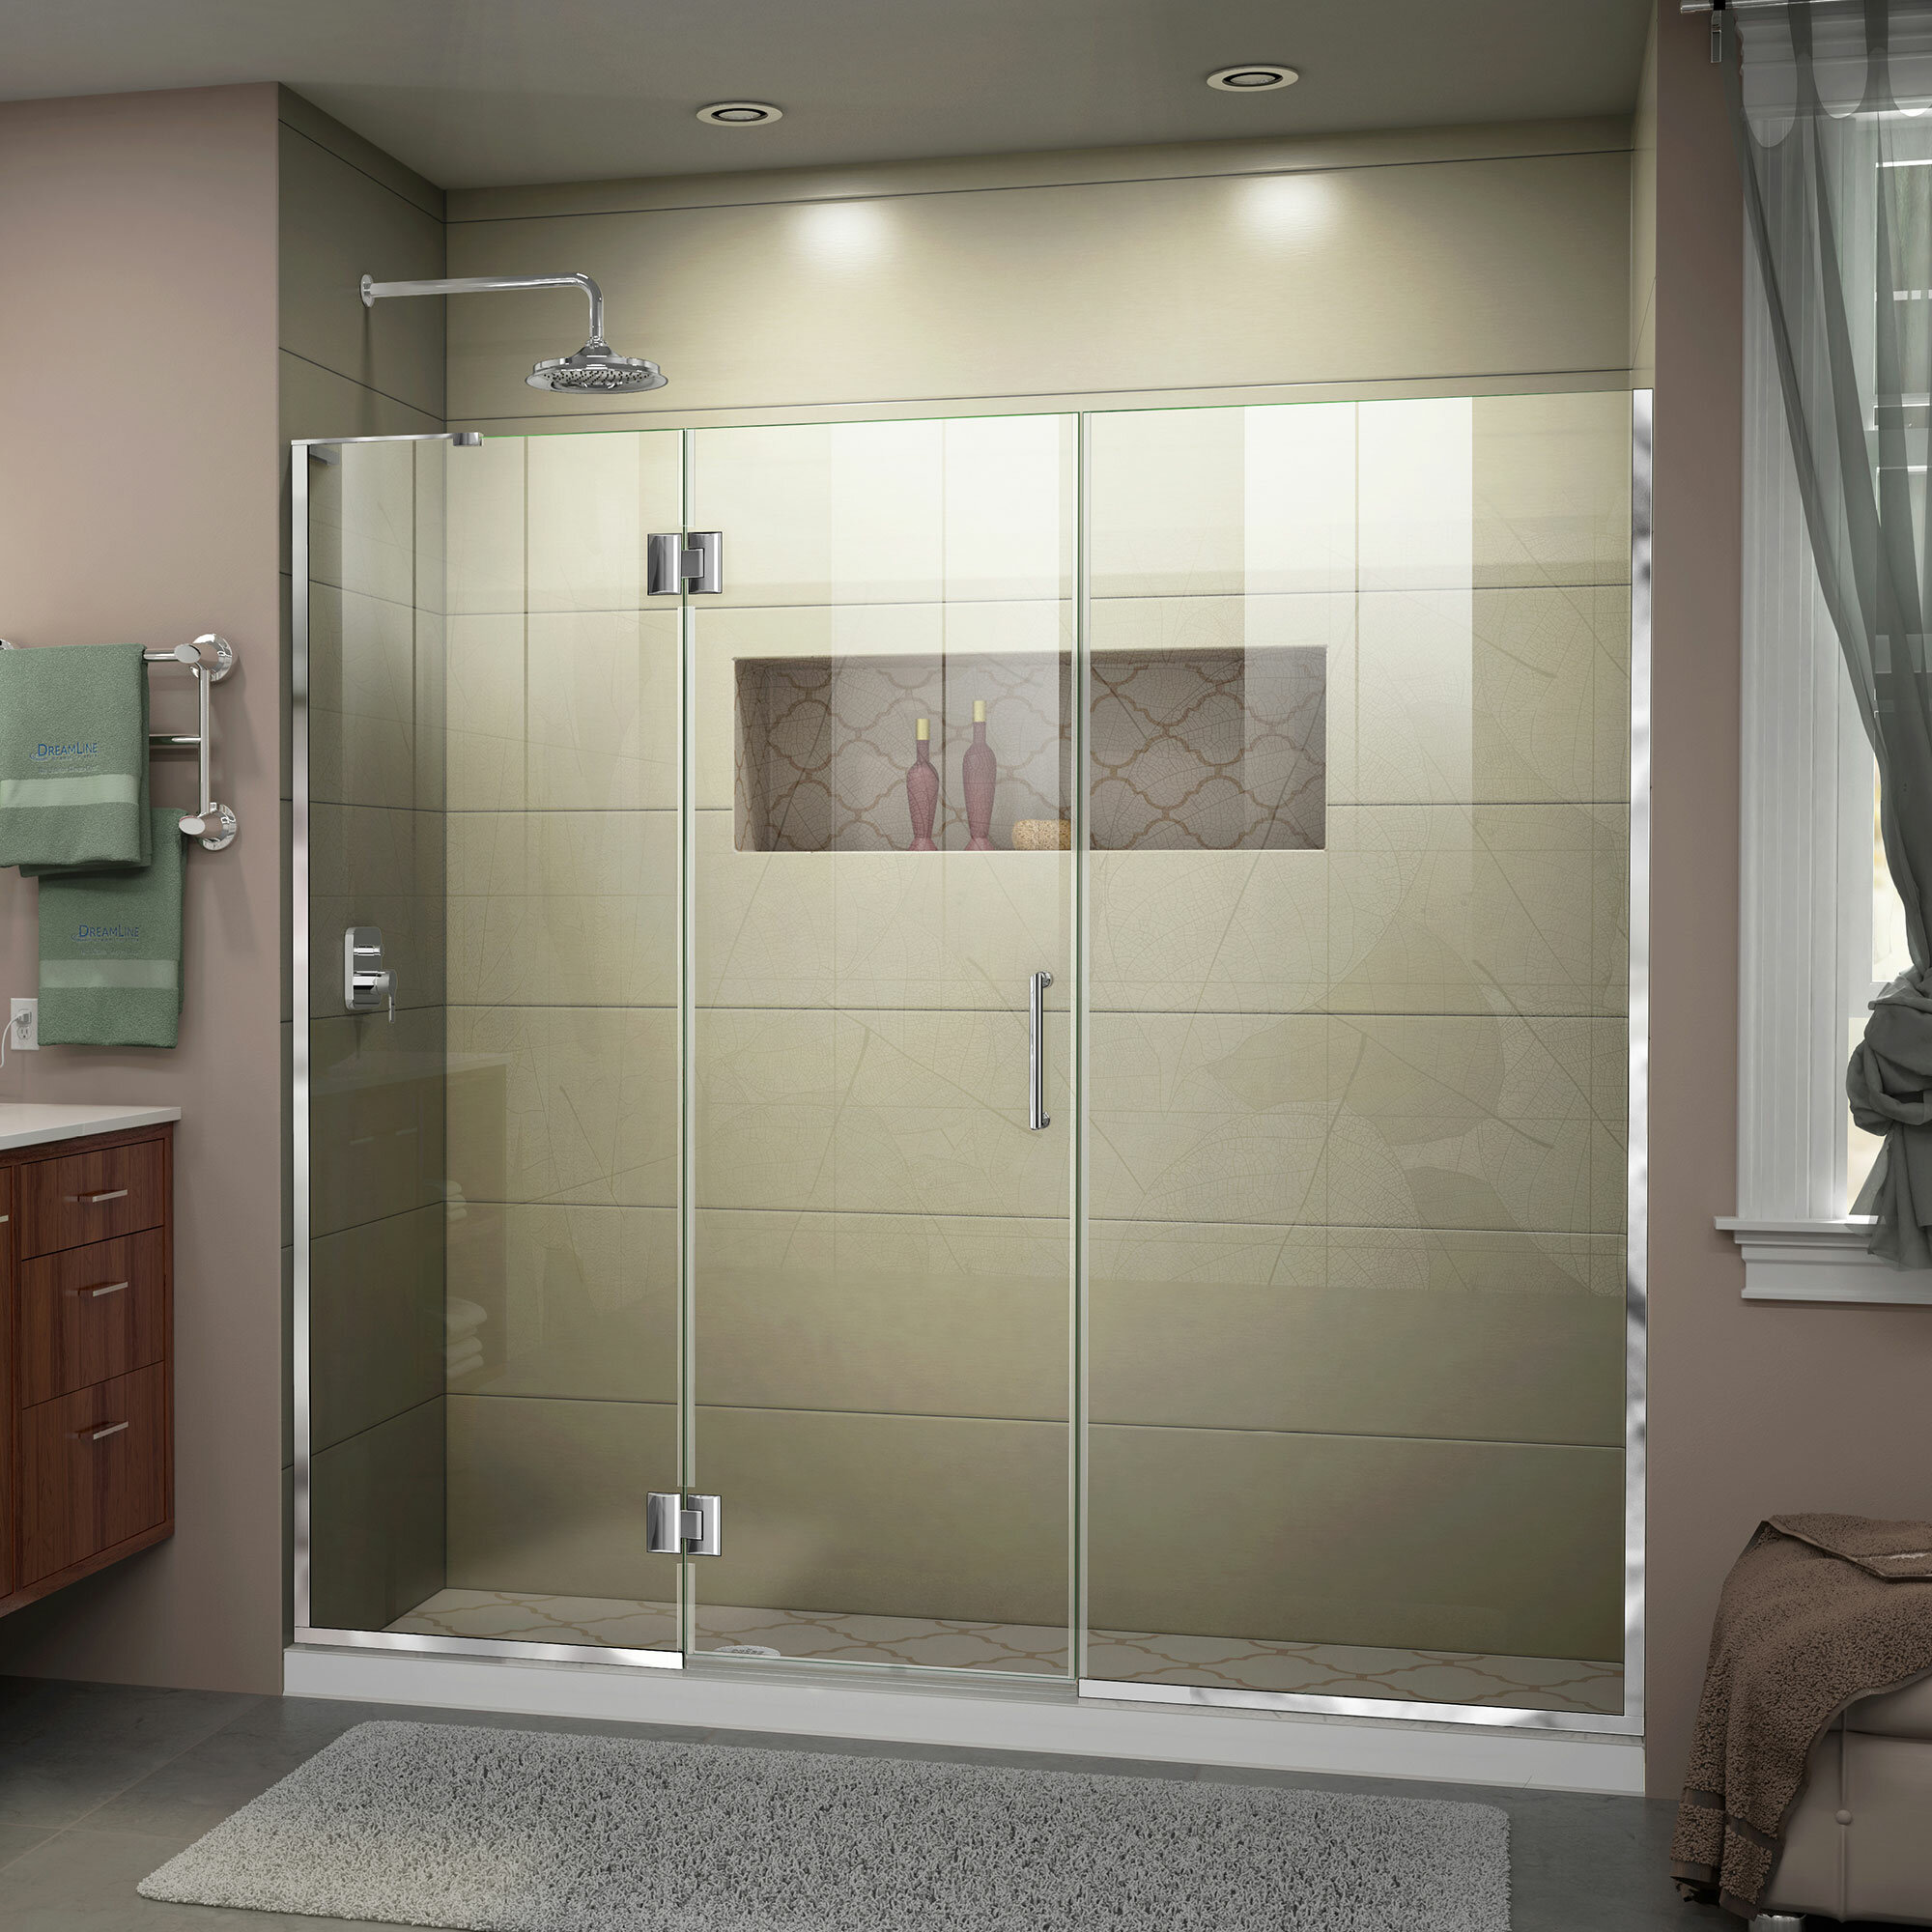 Unidoor X 69 X 72 Hinged Frameless Shower Door With Clearmax Technology